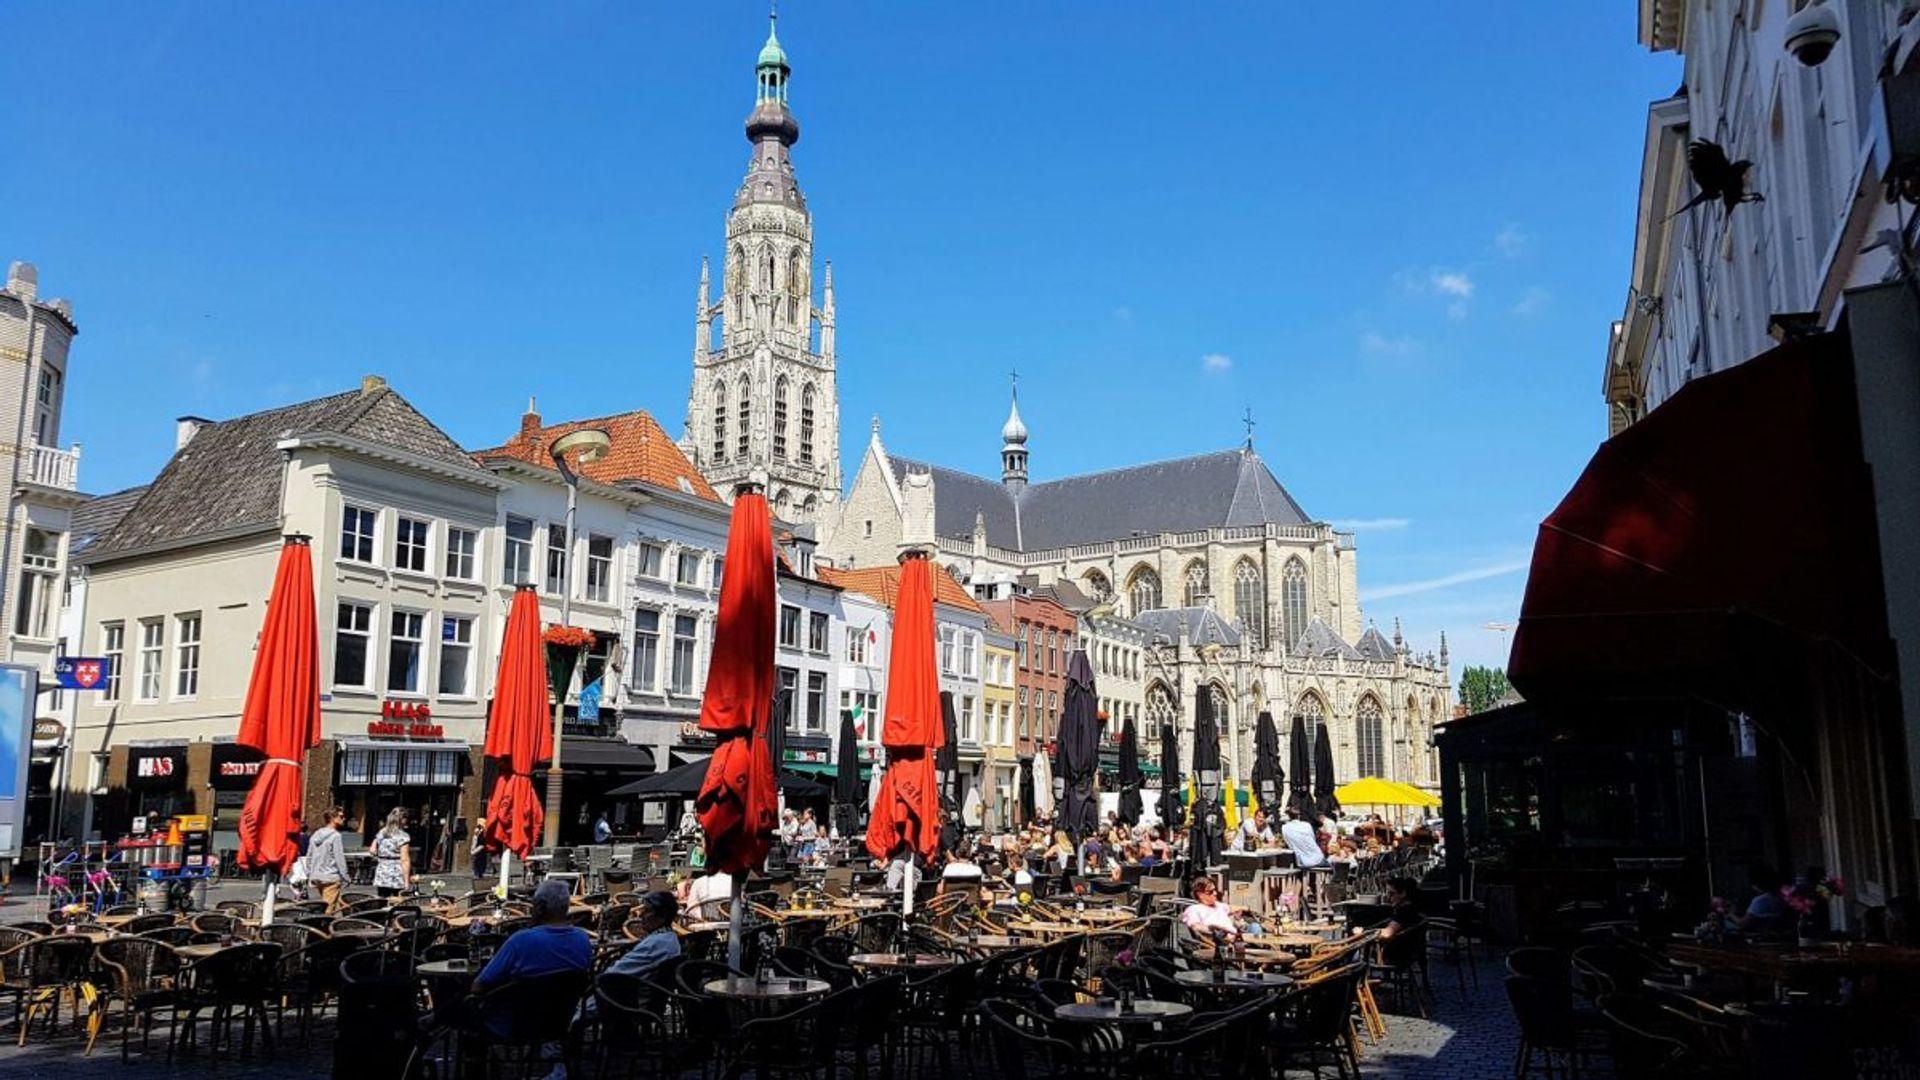 Horecaondernemer Dirk gaat z'n terrassen in Breda weer opengooien: